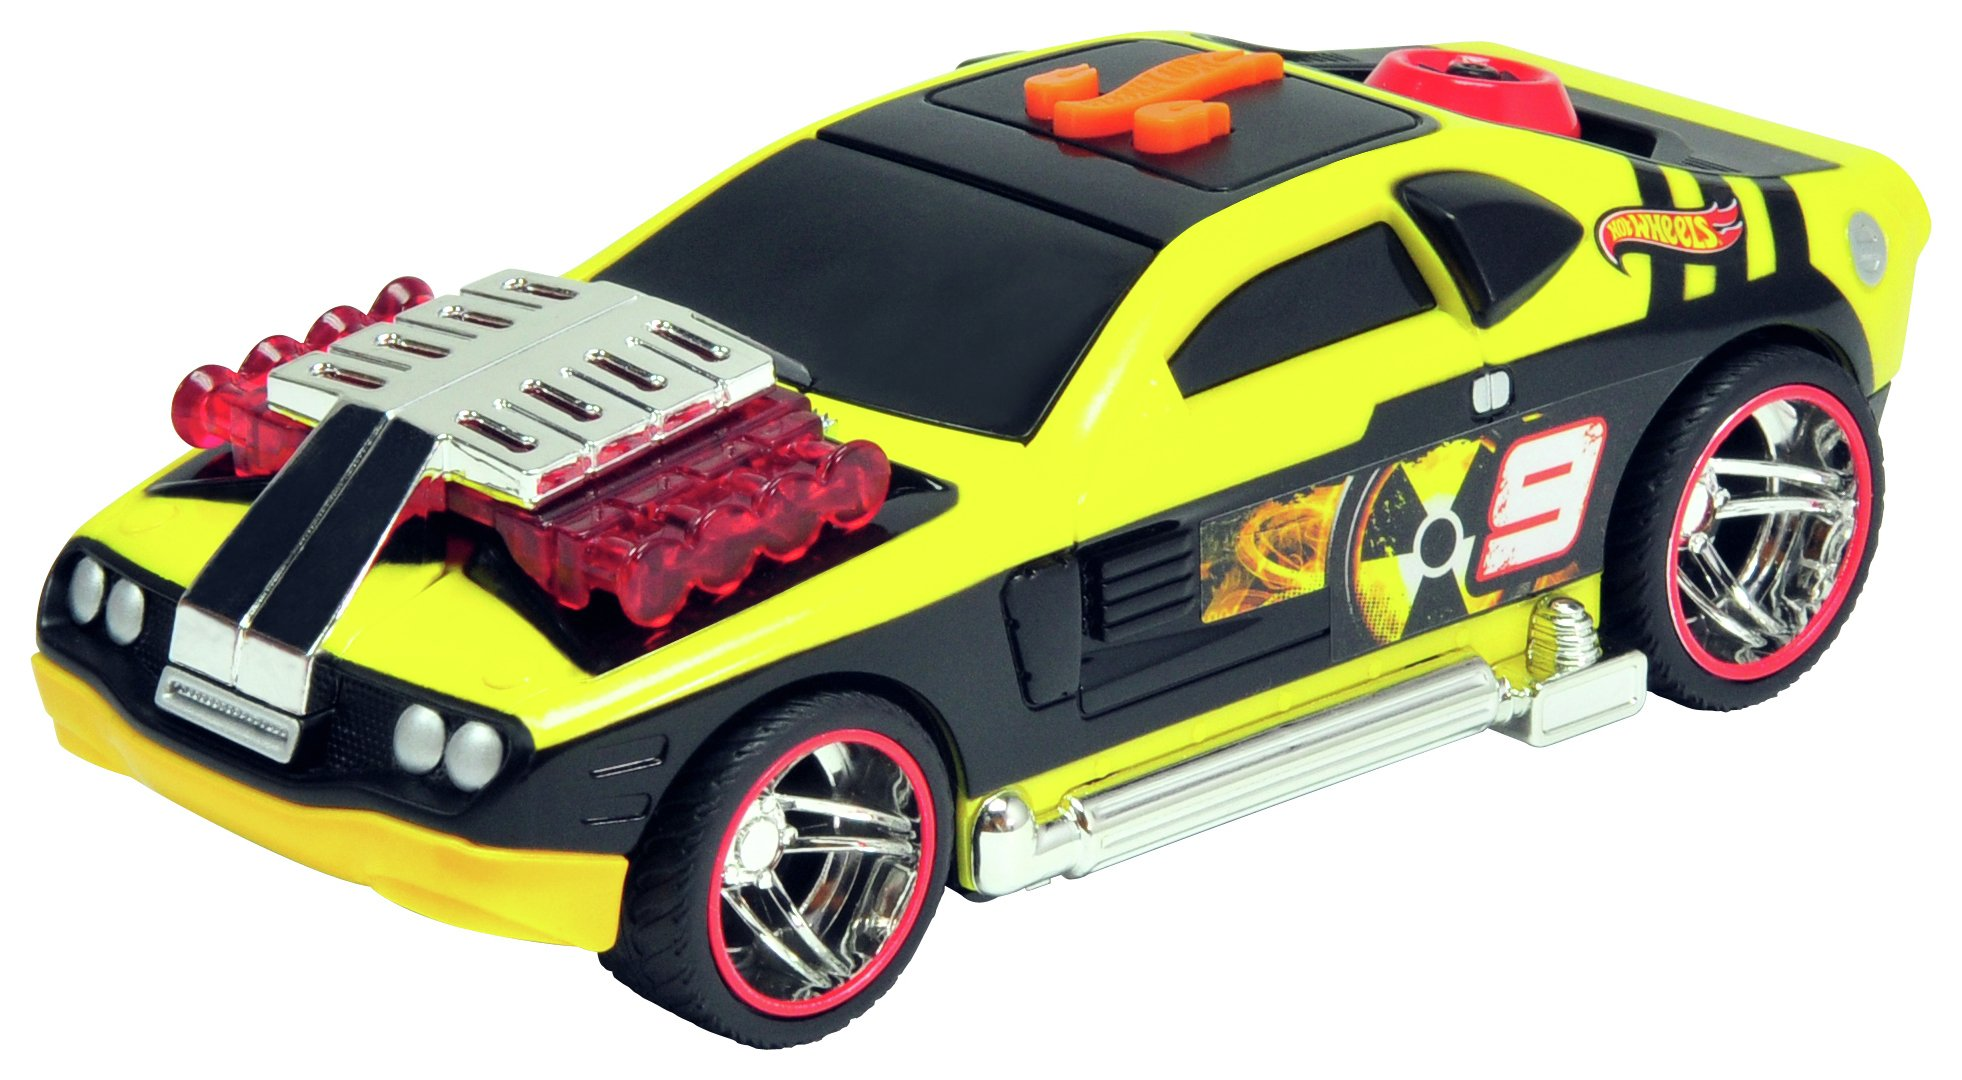 Hot Wheels Hollowback Flash Drifter Motorised Car.